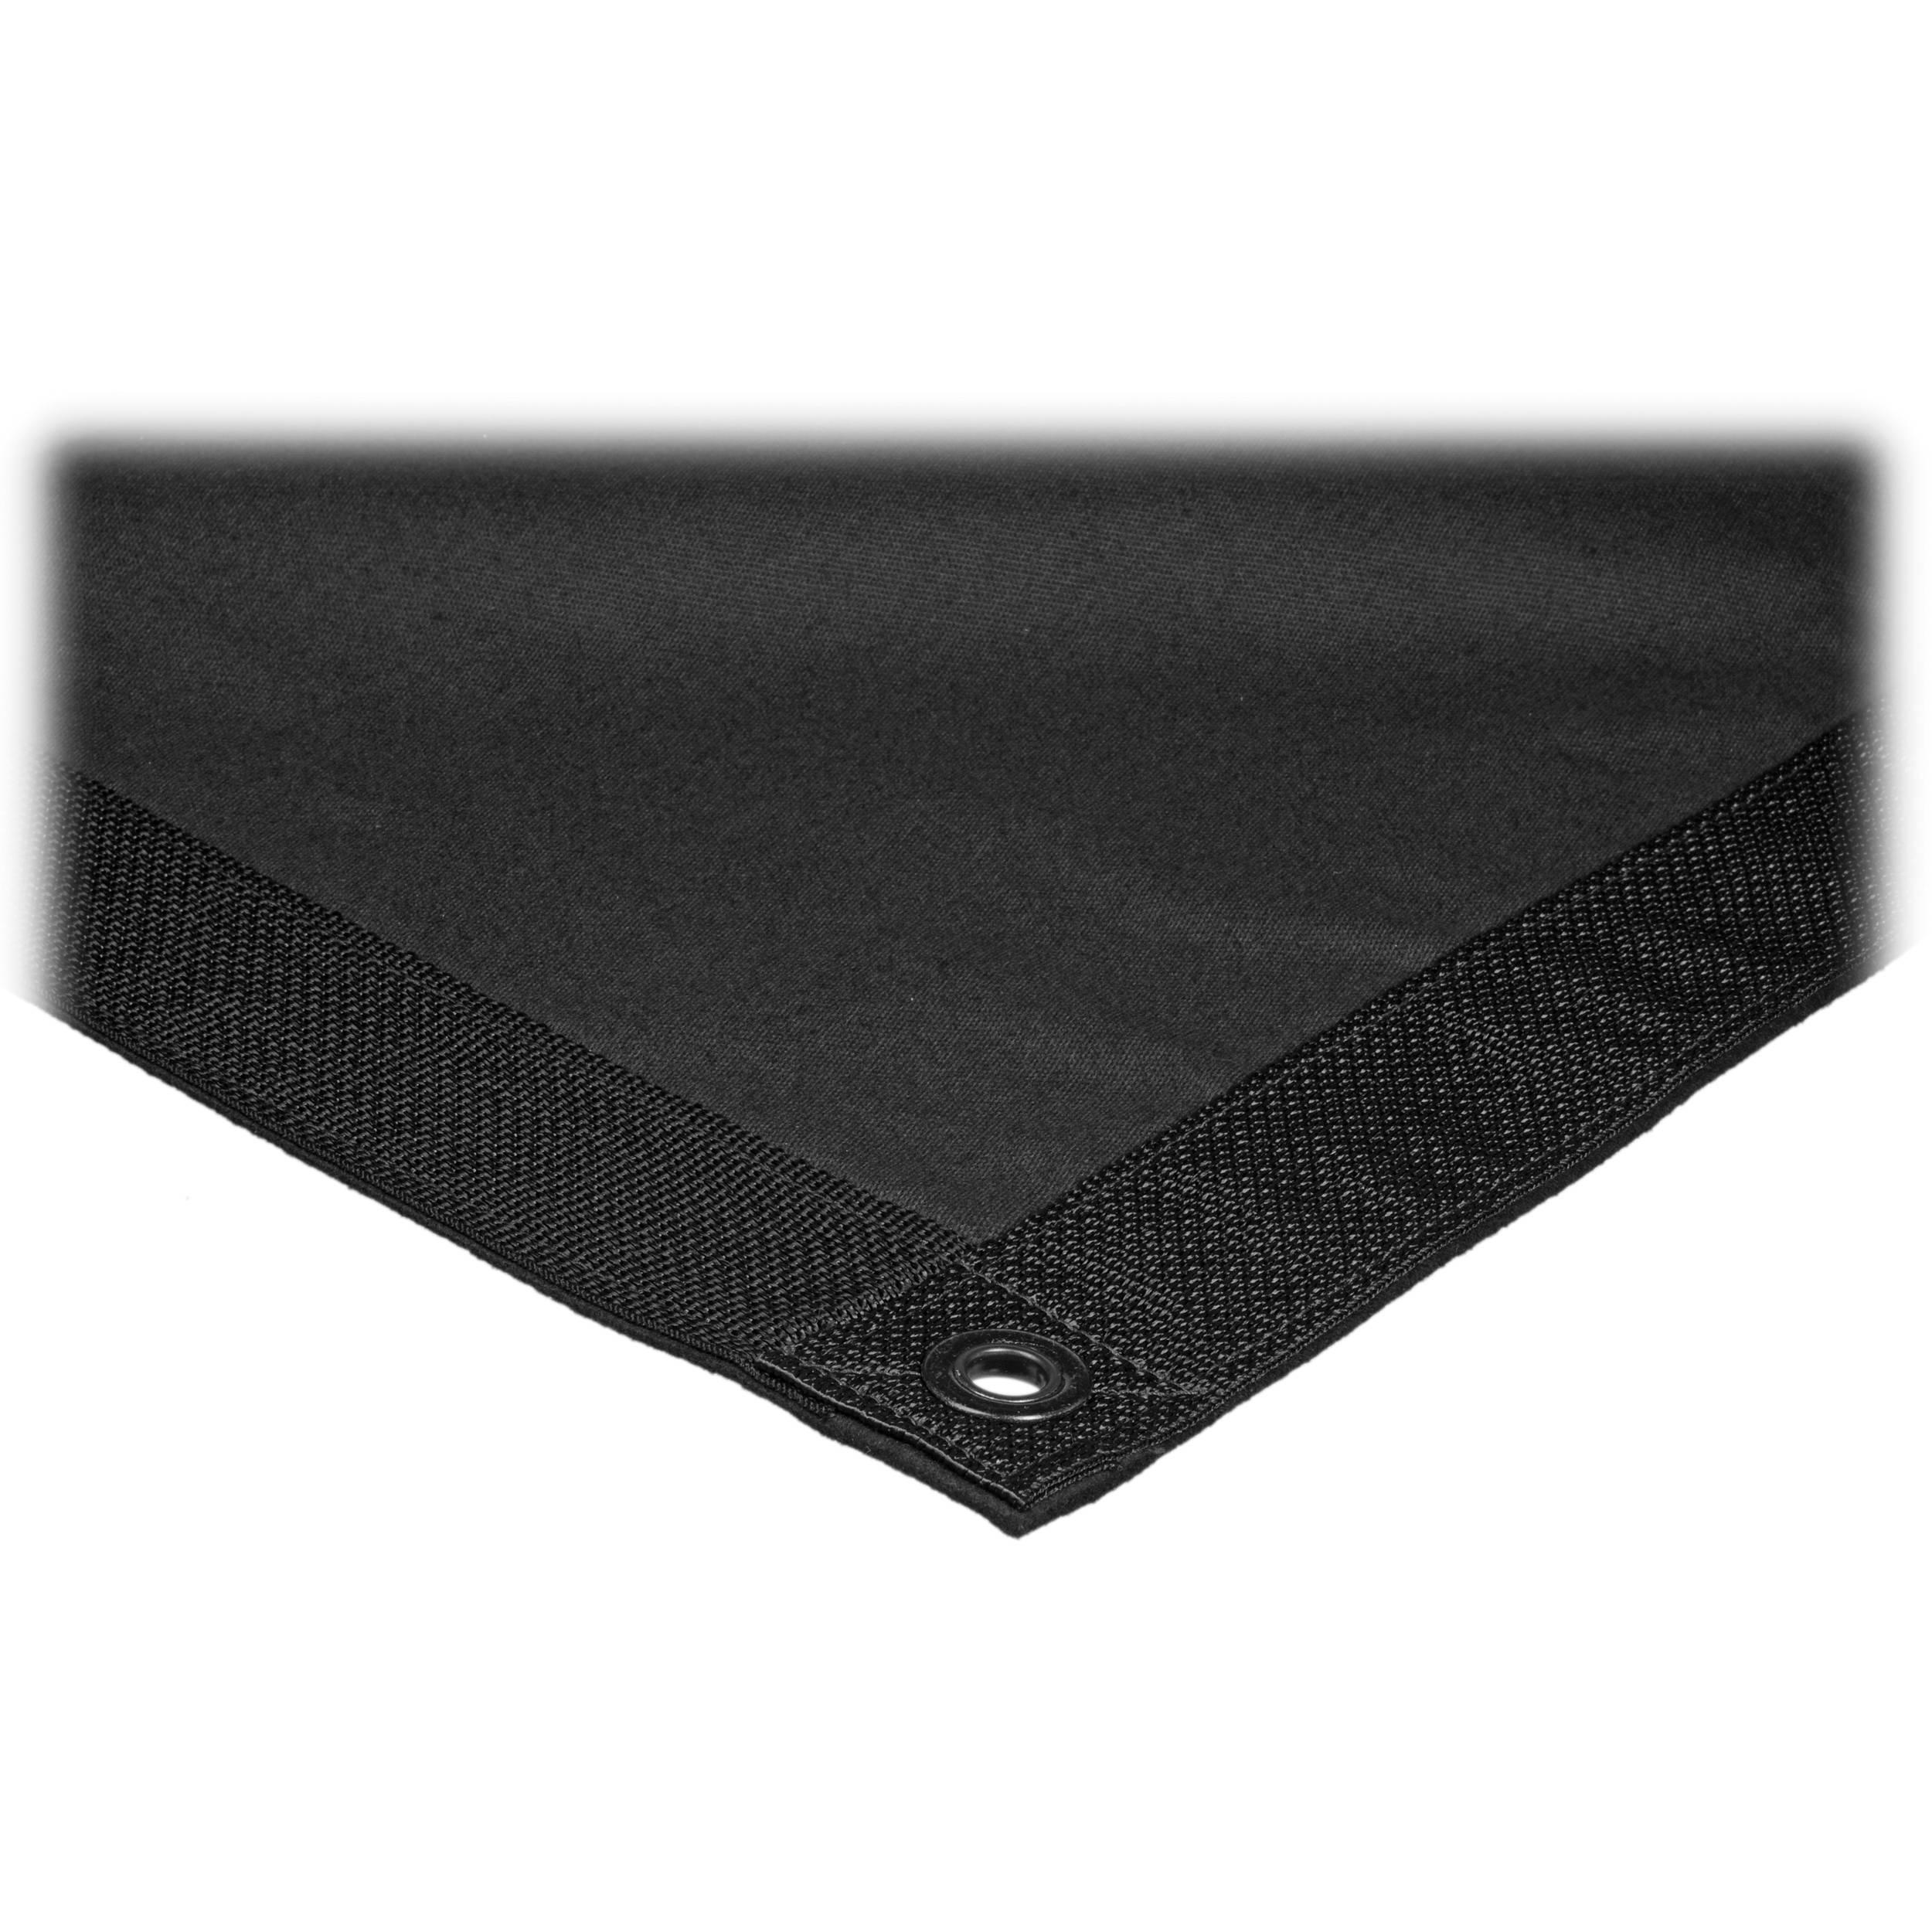 MT319913 12′ x 12′ Waterproof Solid Overhead, Black